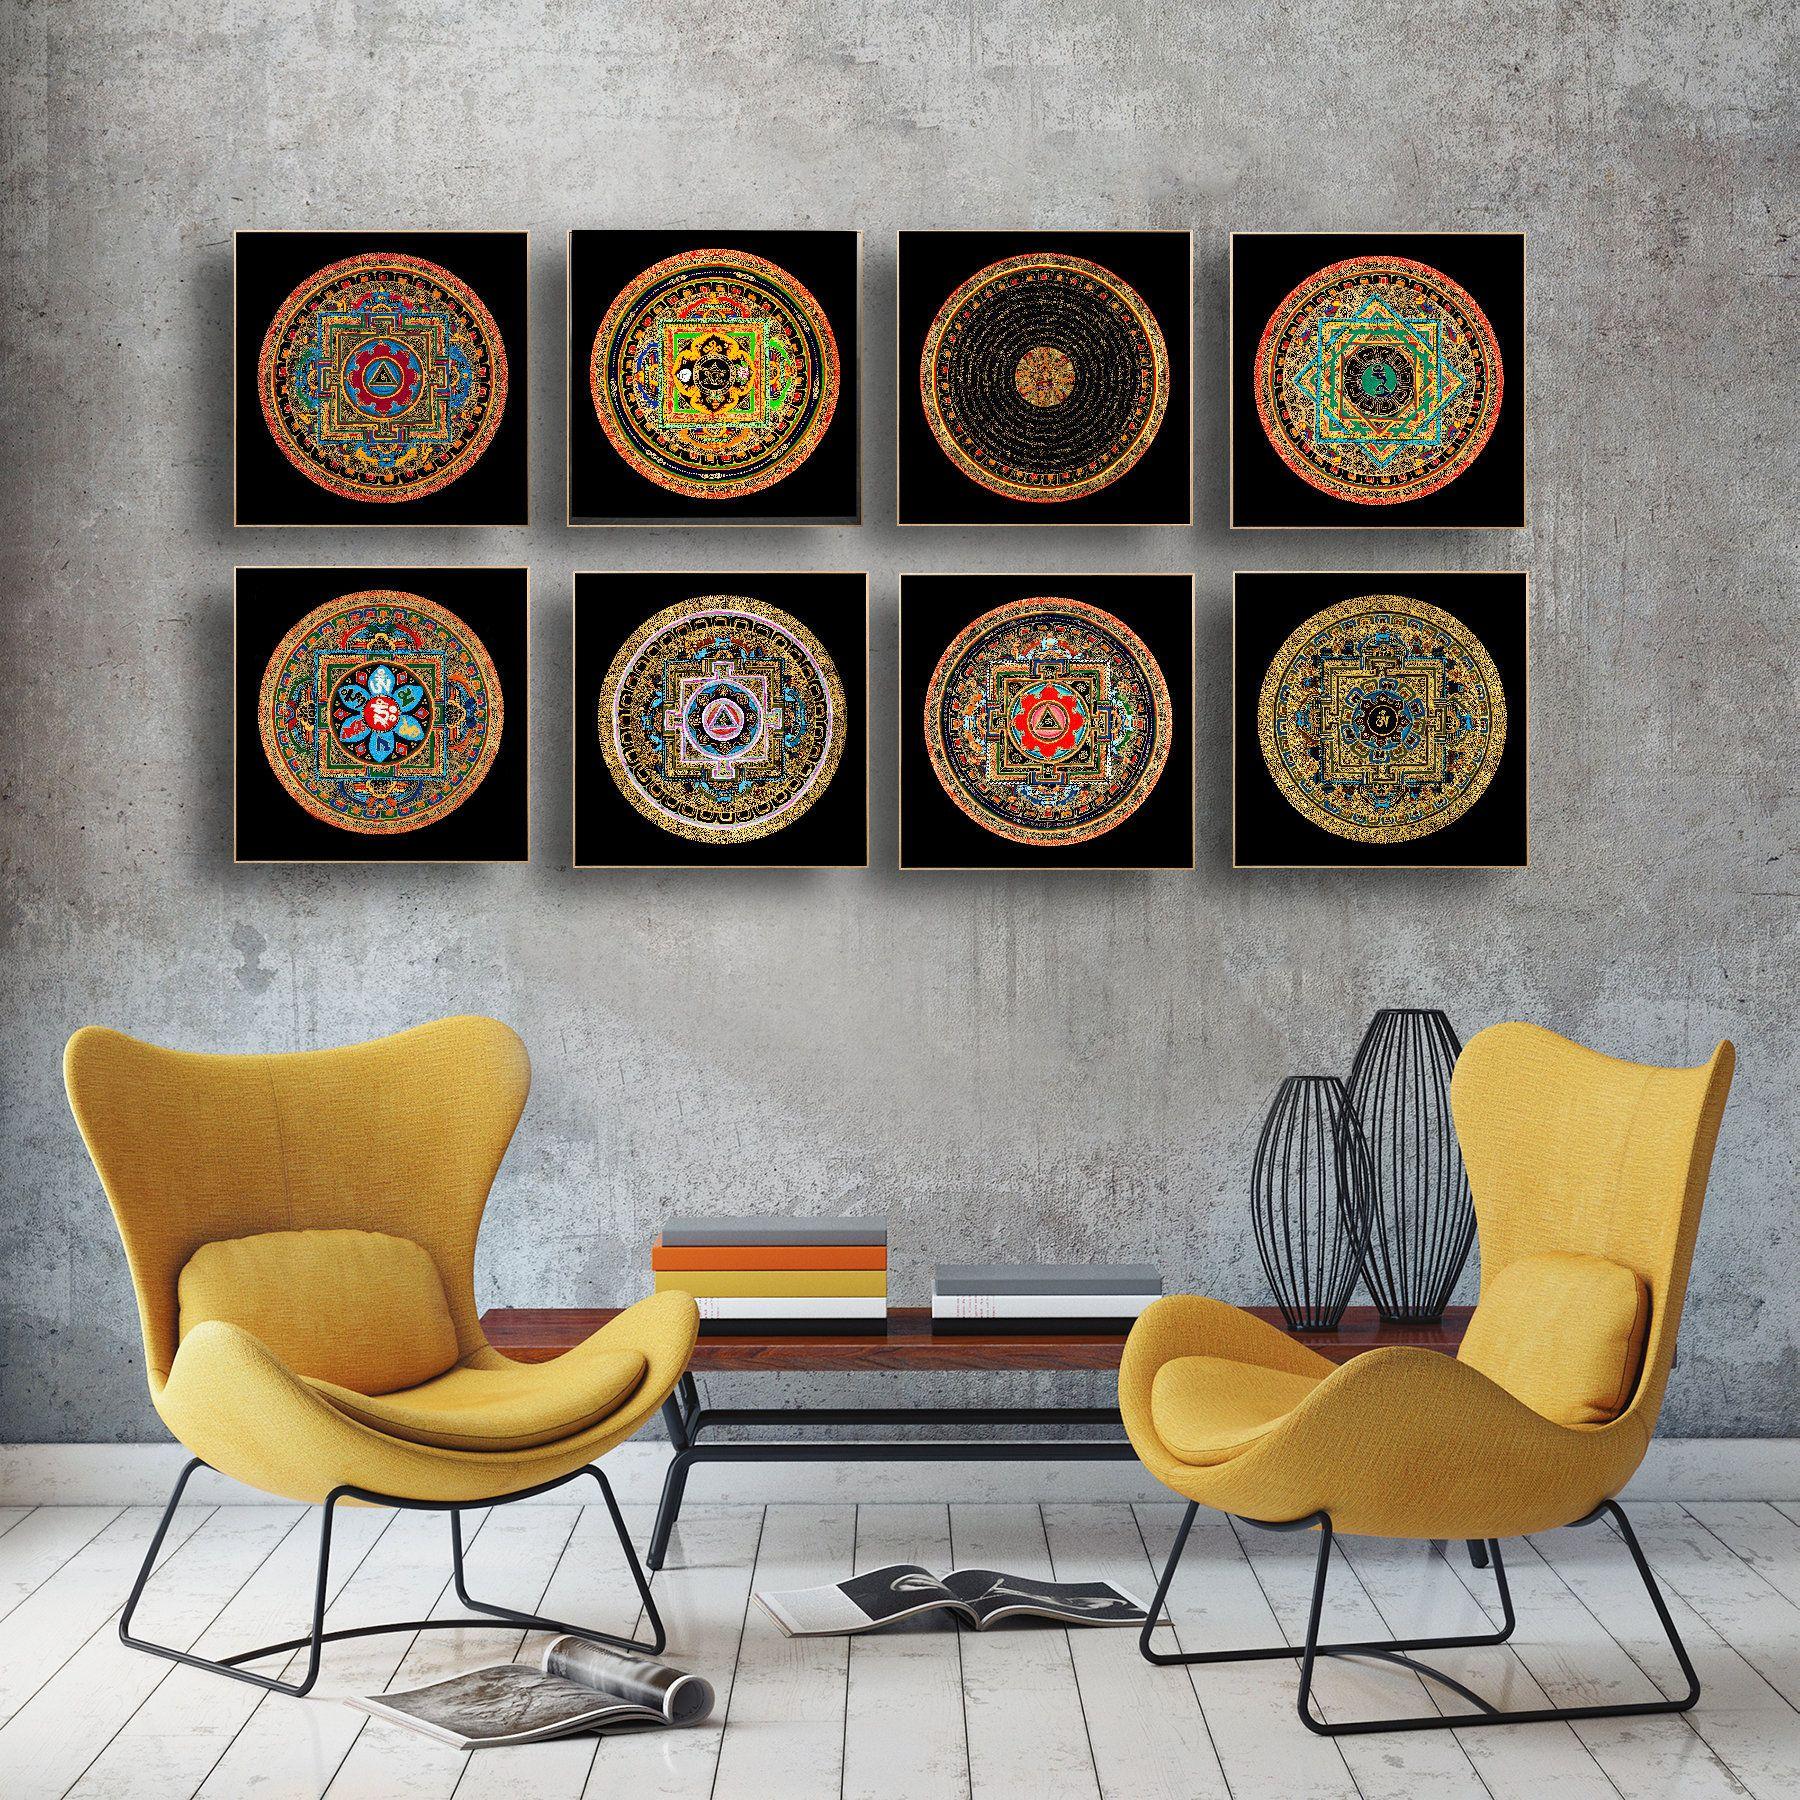 Tibetan Mandala Art Prints Modern Home Decor Wall Art Yoga Etsy Tibetan Mandala Art Tibetan Mandala Home Decor Wall Art